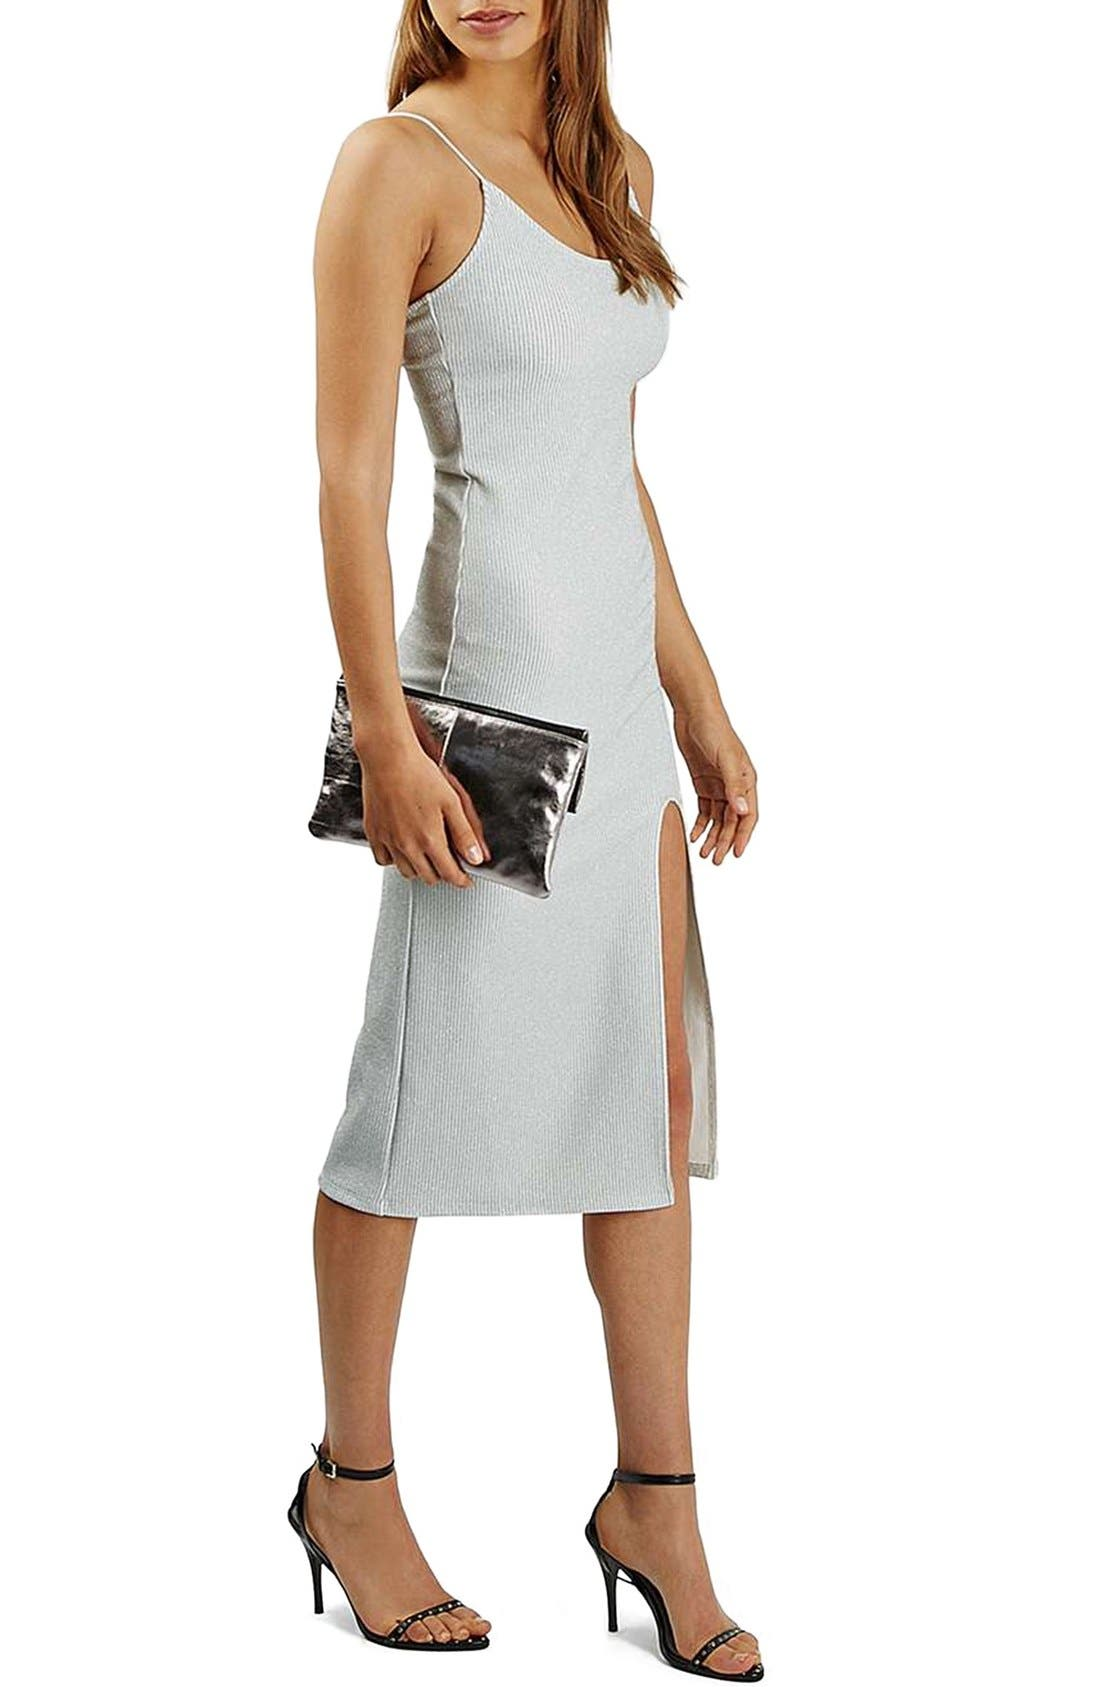 Alternate Image 1 Selected - Topshop Scoop Neck Midi Dress